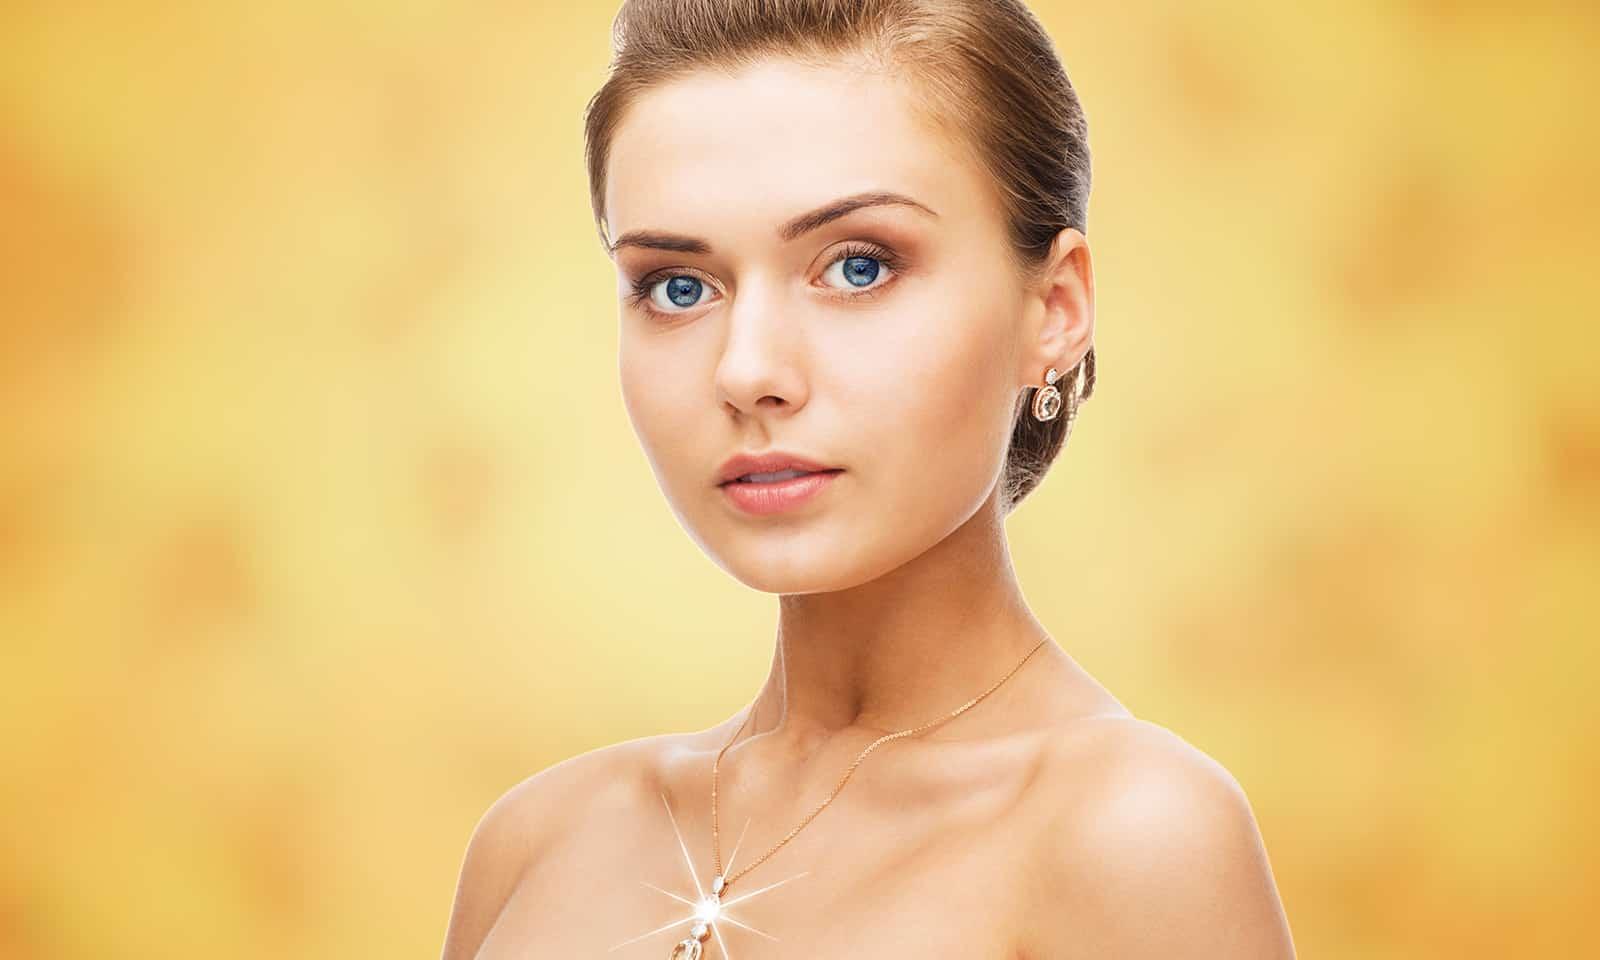 how-to-have-beautiful-posture-main-image-viva-glam